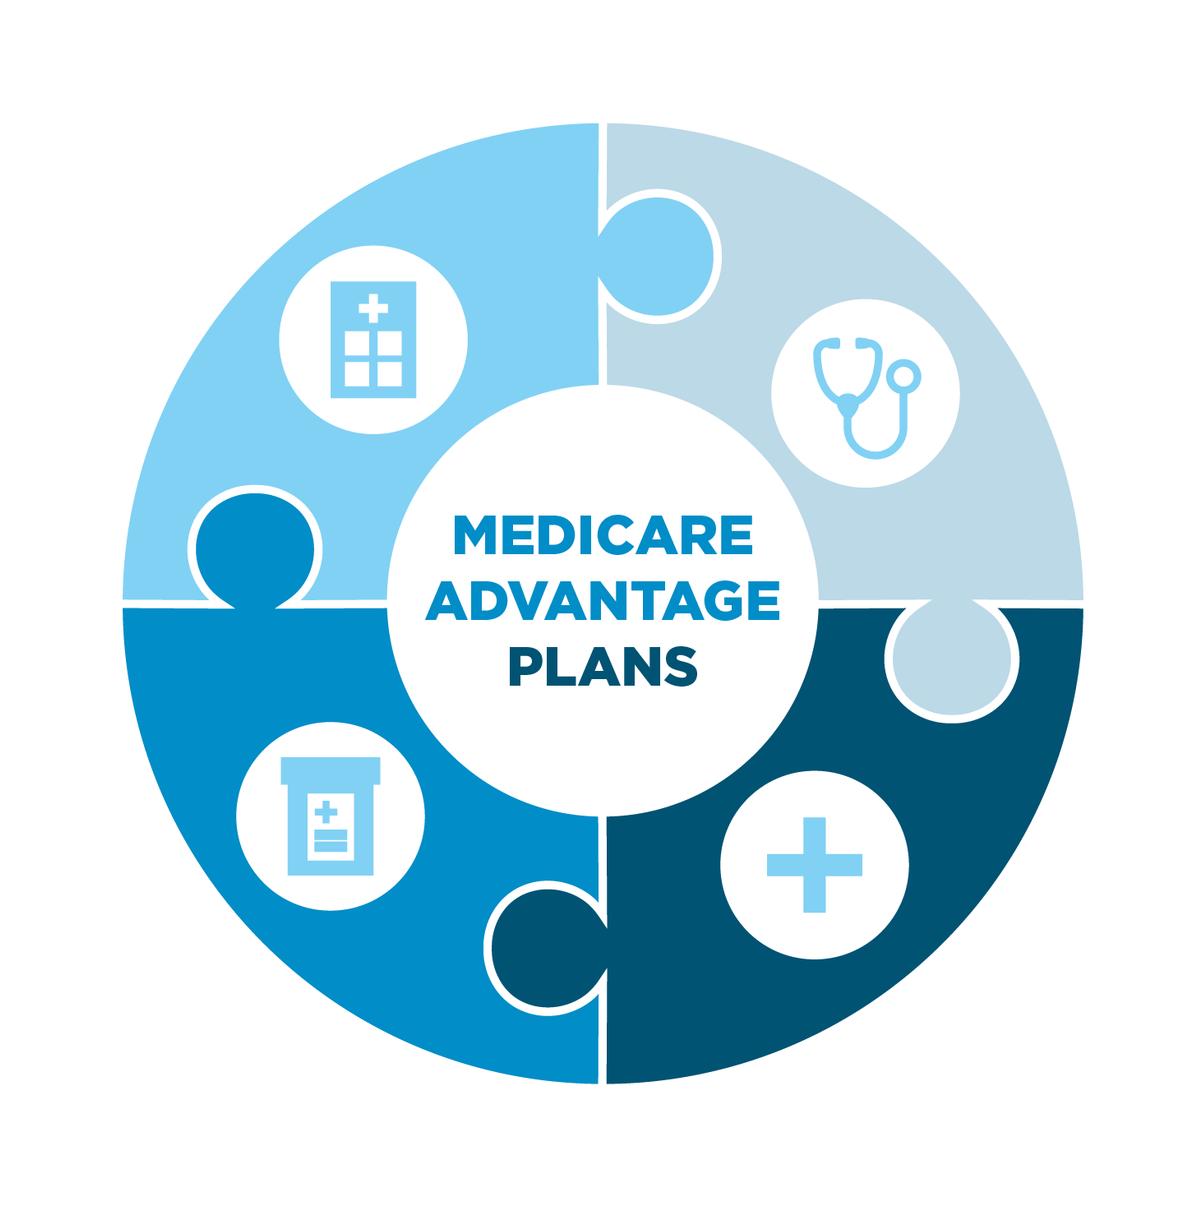 Should You Invest in Medicare Advantage Plans?